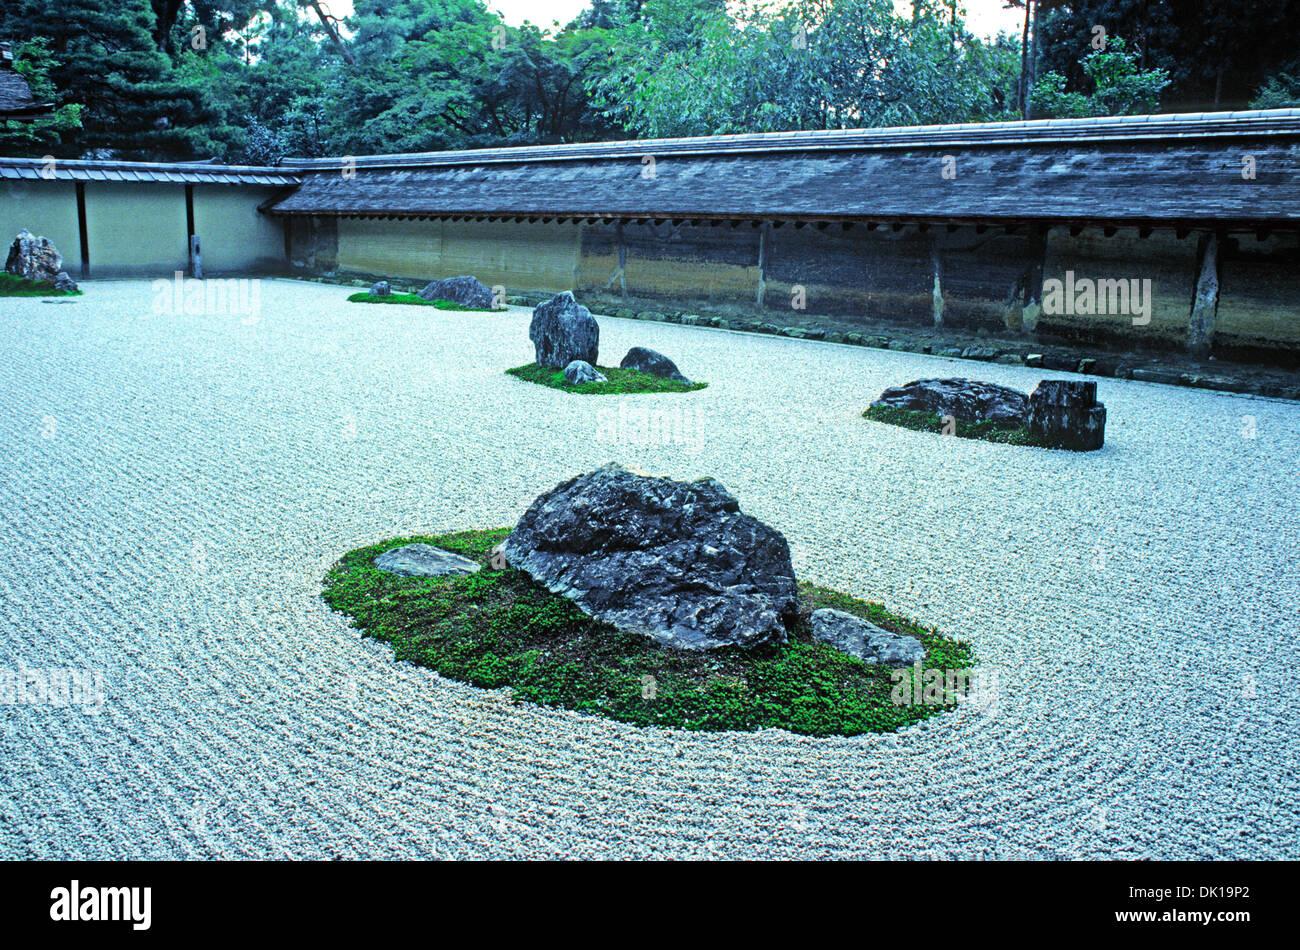 Ryoanji Zen Buddhist Temple Rock Garden In Kyoto.